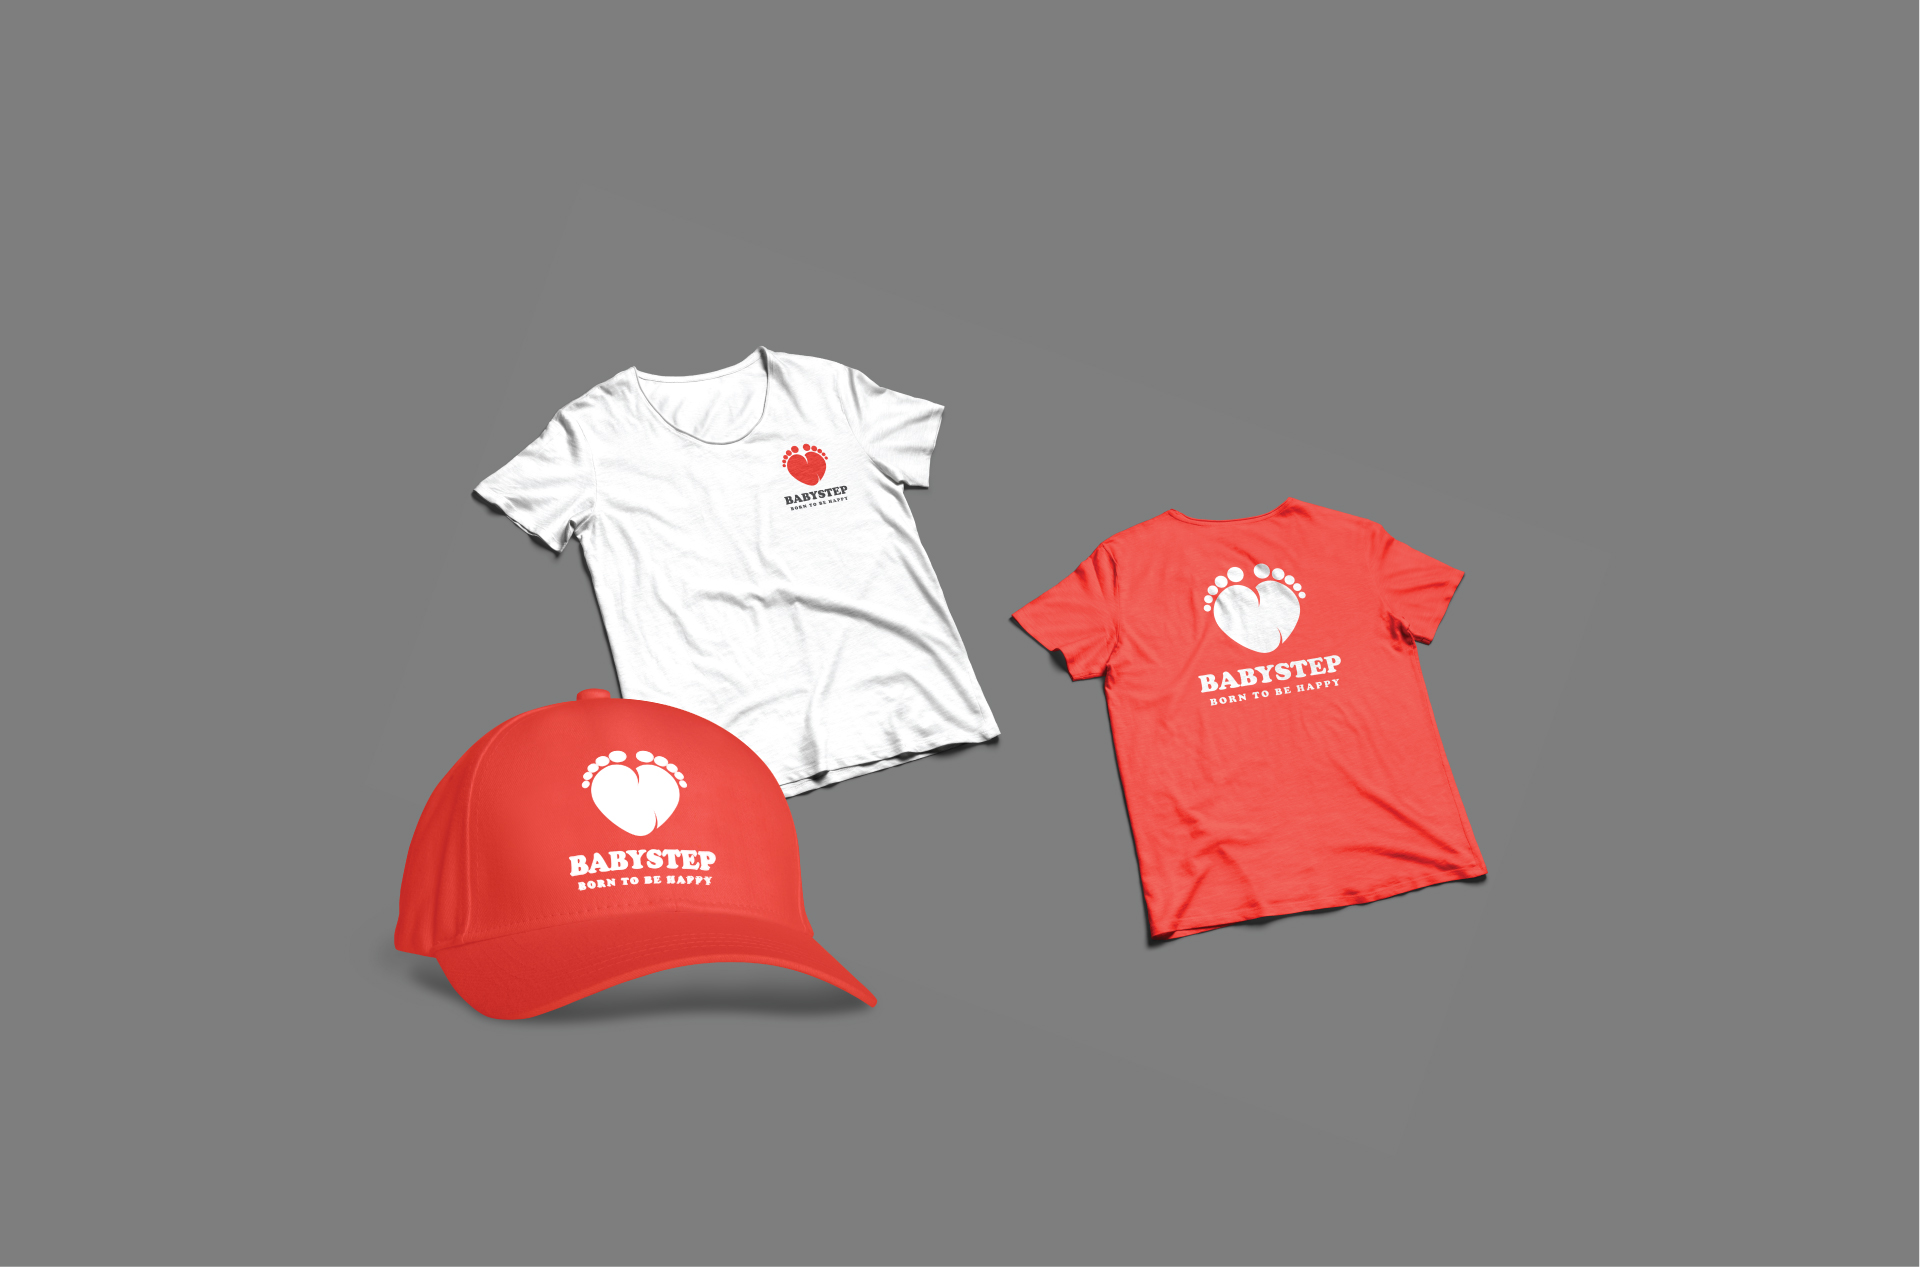 babystep brandbook (t-shirt & cap design), ლოგოს დამზადება, ლოგოს დიზაინი, ლოგოების შექმნა, ლოგოების დამზადება, ლოგოს დამზადების ფასი,  ბრენდინგი, ბანერების დამზადება, ლოგოტიპის შექმნა, ლოგოტიპების დიზაინი, ოპტიმიზაცია, facebook დიზაინი, ვებგვერდის დიზაინი, ლოგოების დიზაინი, ლოგოტიპების დამზადება, saitebis damzadena, logoebis damzadena, saitis damzadeba, logos damzadeba,